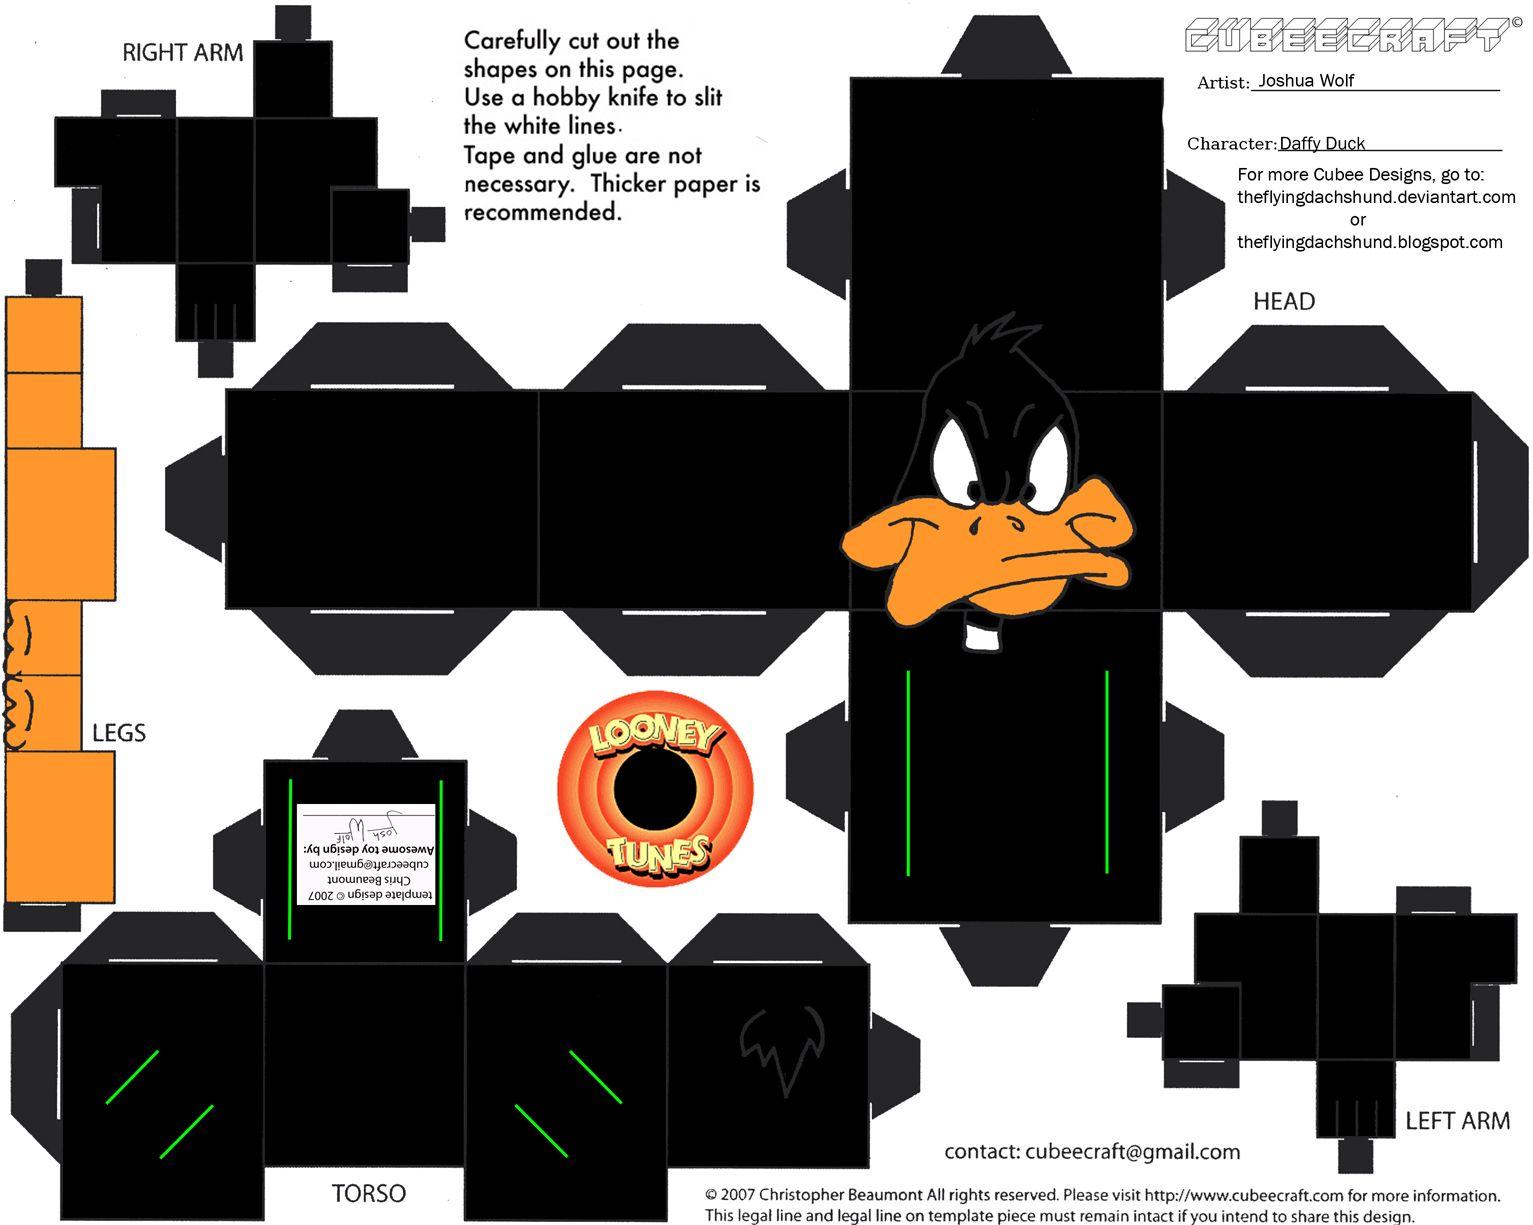 PaperToy_WB - Daffy Duck